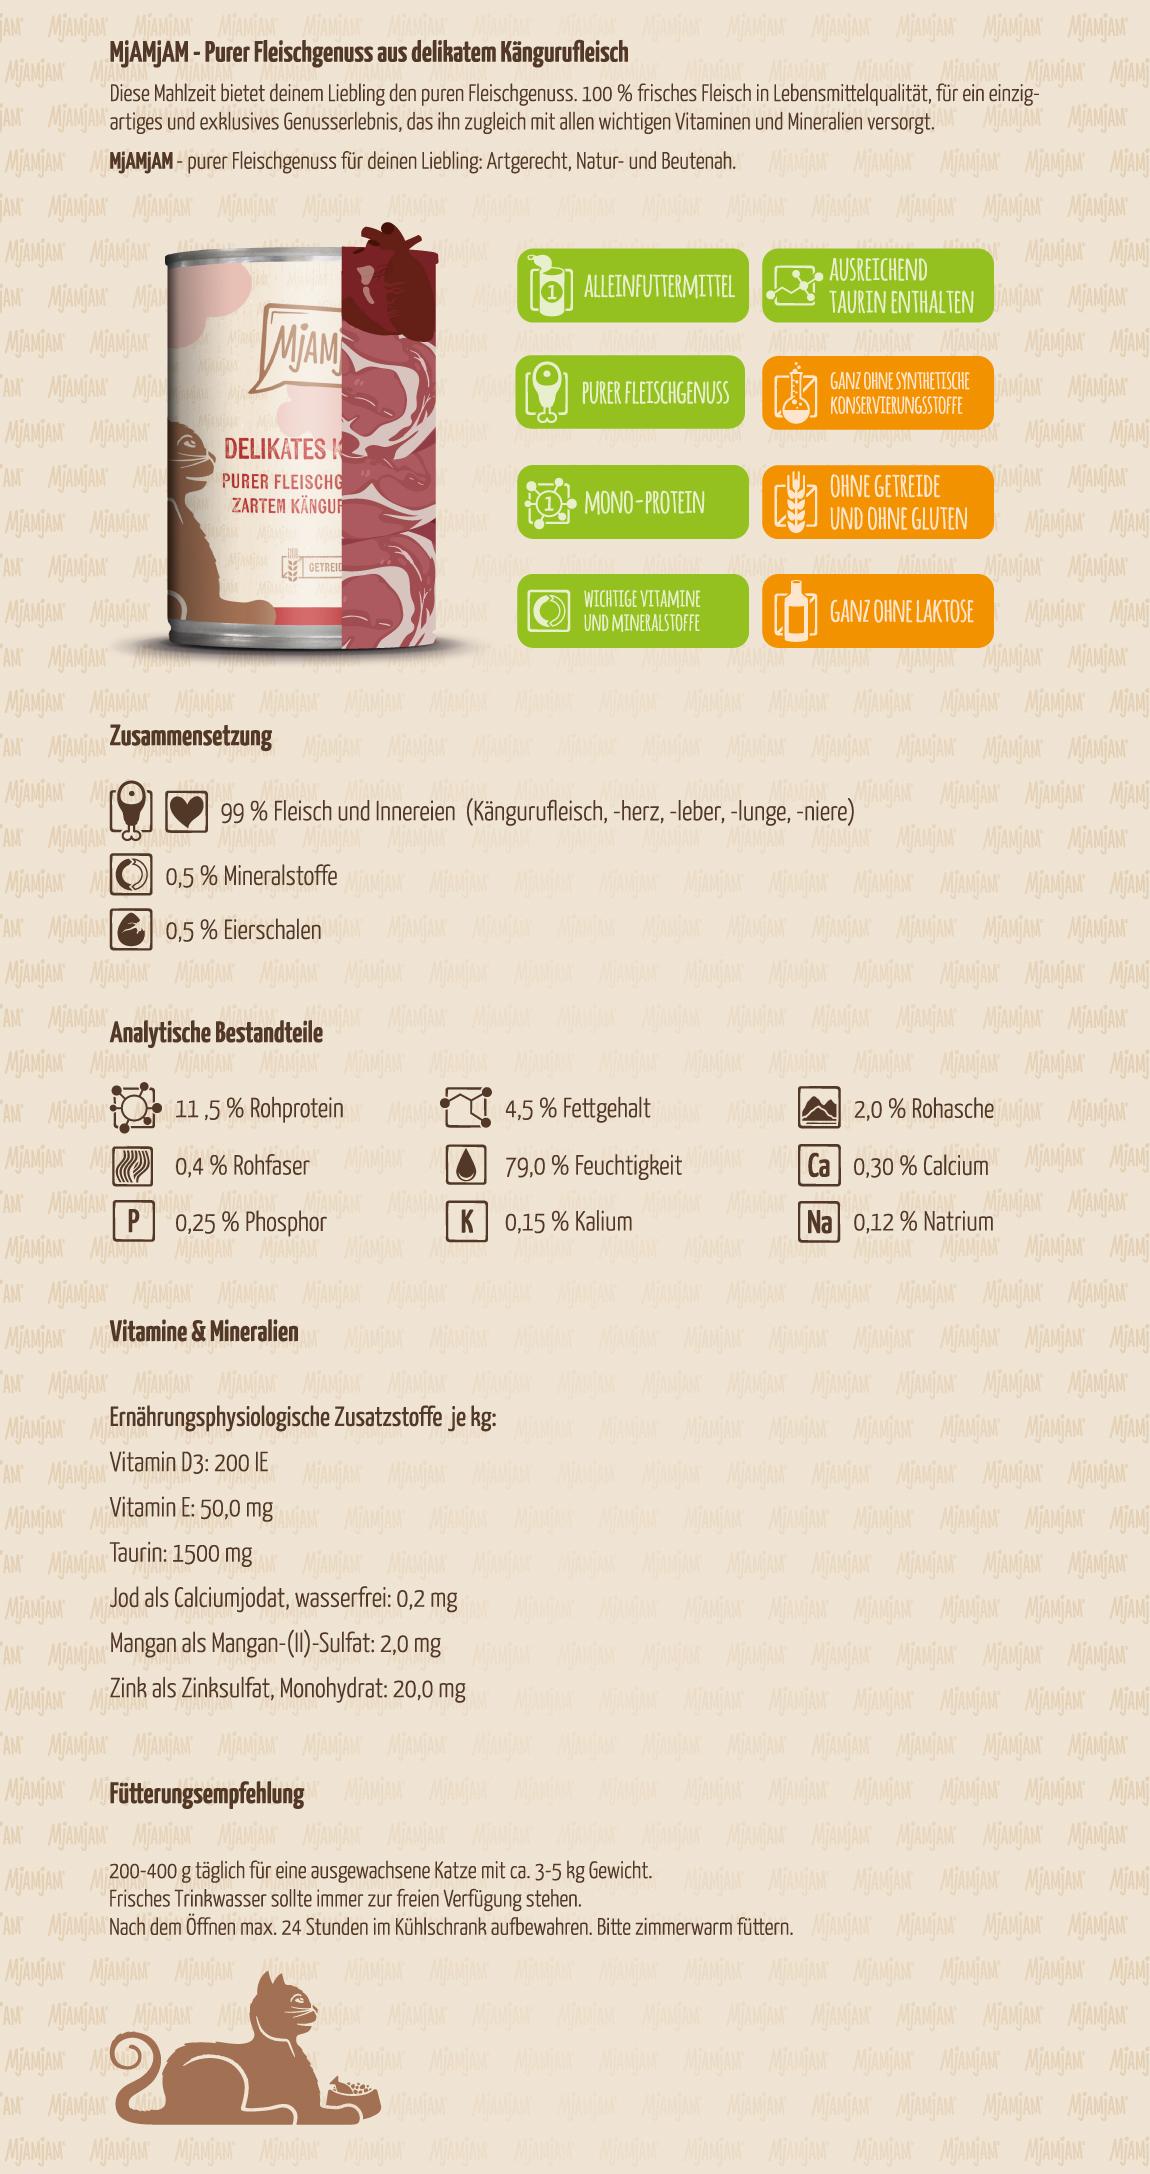 Mjamjam_Produktbeschreibung_Katze_PUR_Delikates-KaengurufleischrXc61yNJow5Pn